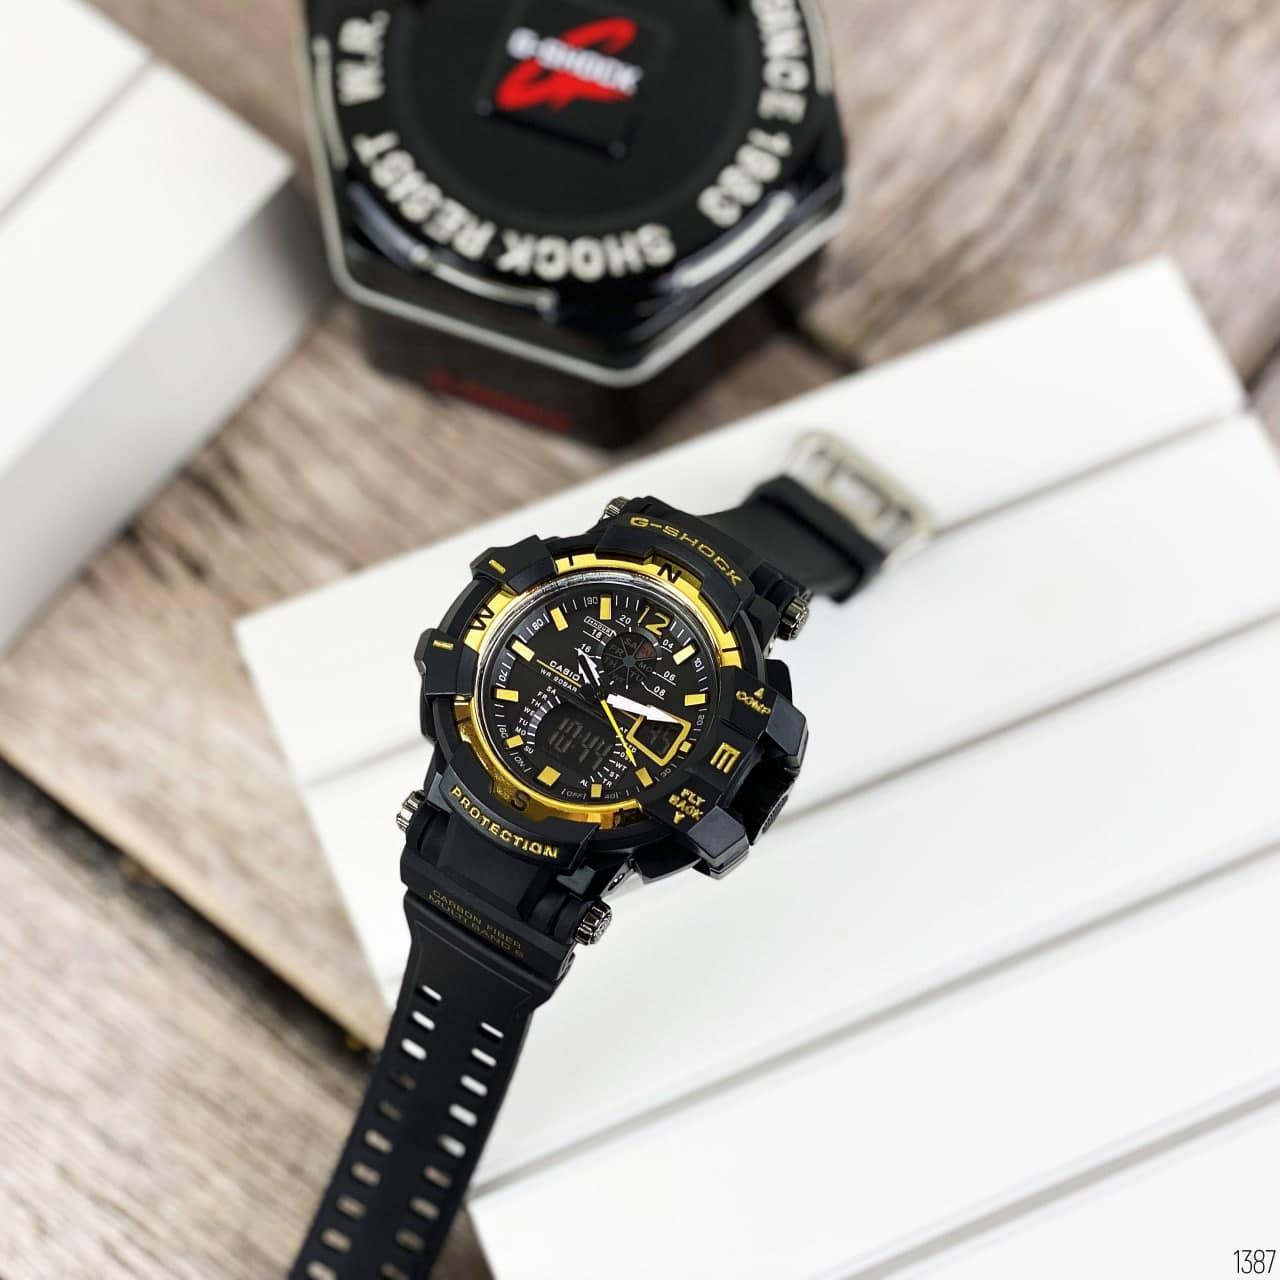 Casio G-Shock GW-A1100 (Black-Gold)